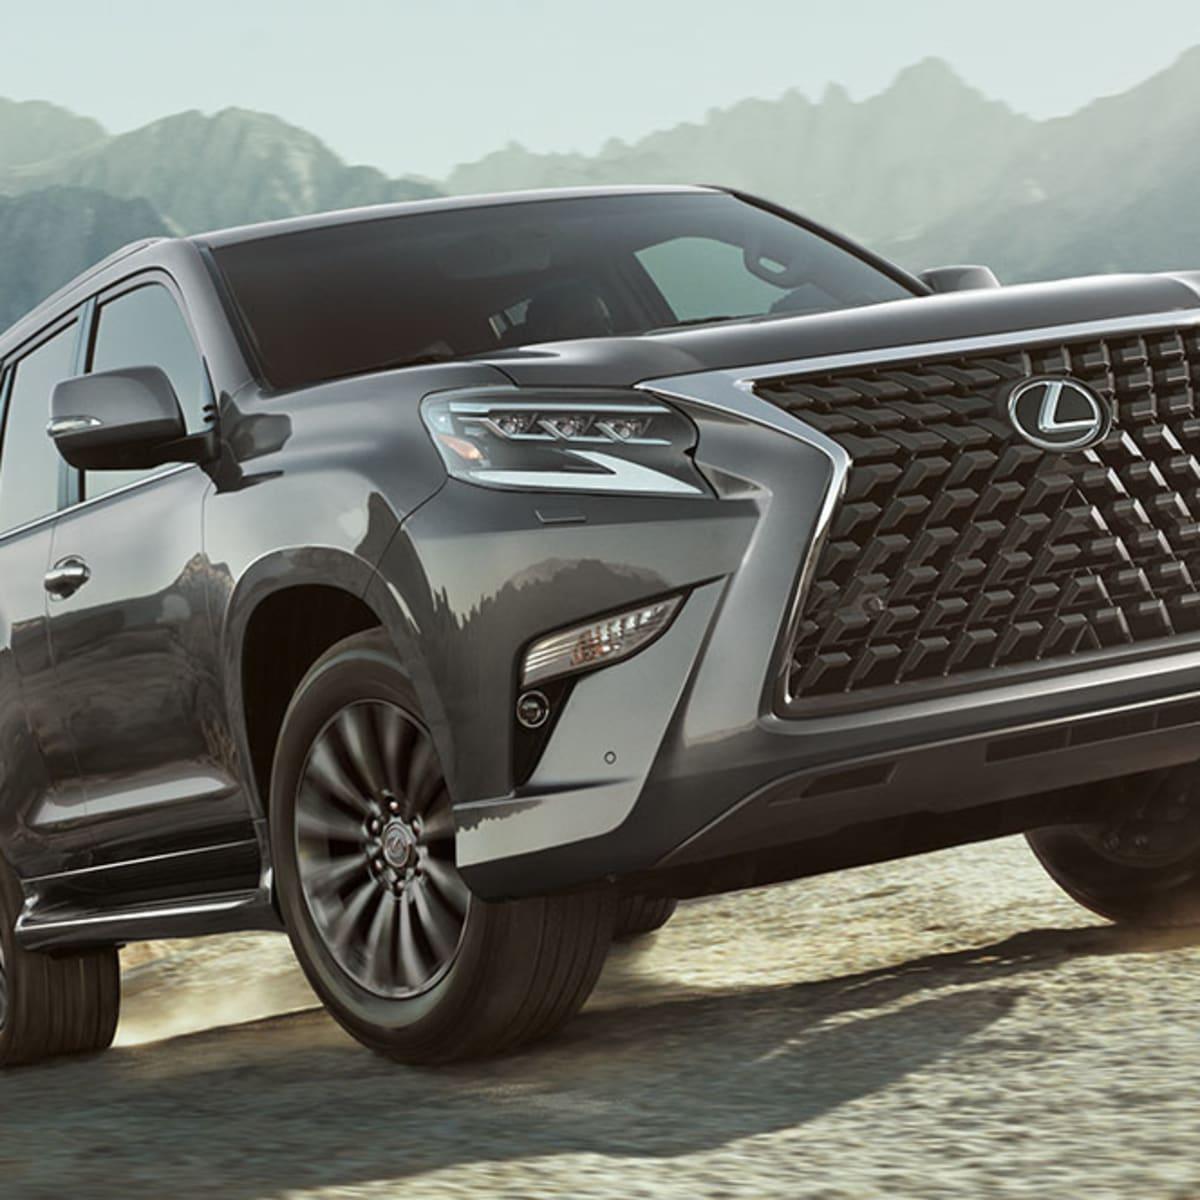 2020 Lexus Gx Facelift Unveiled Caradvice